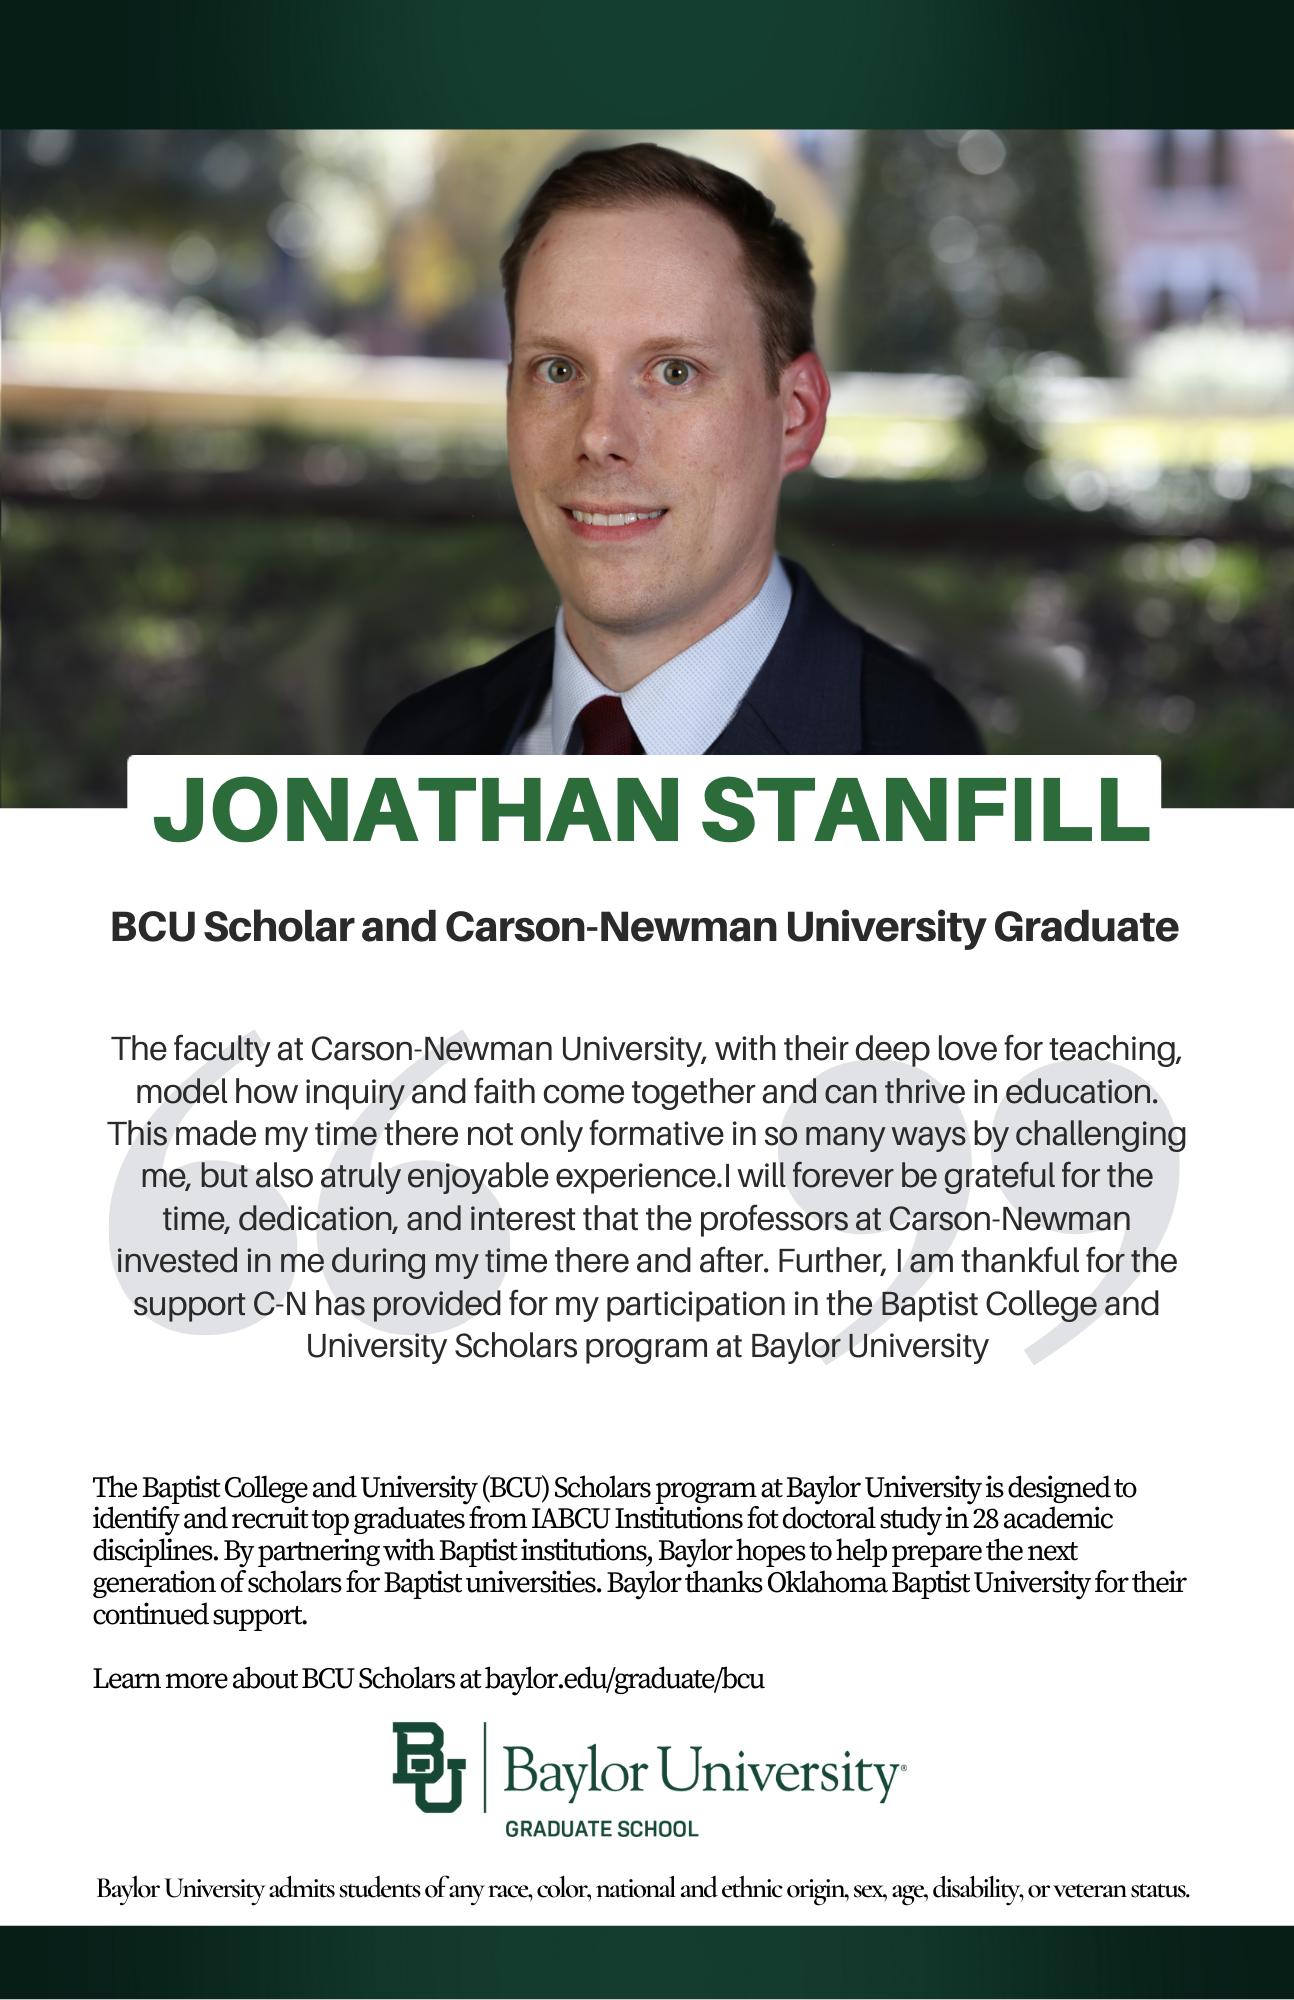 Jonathon Stanfill BCU ad